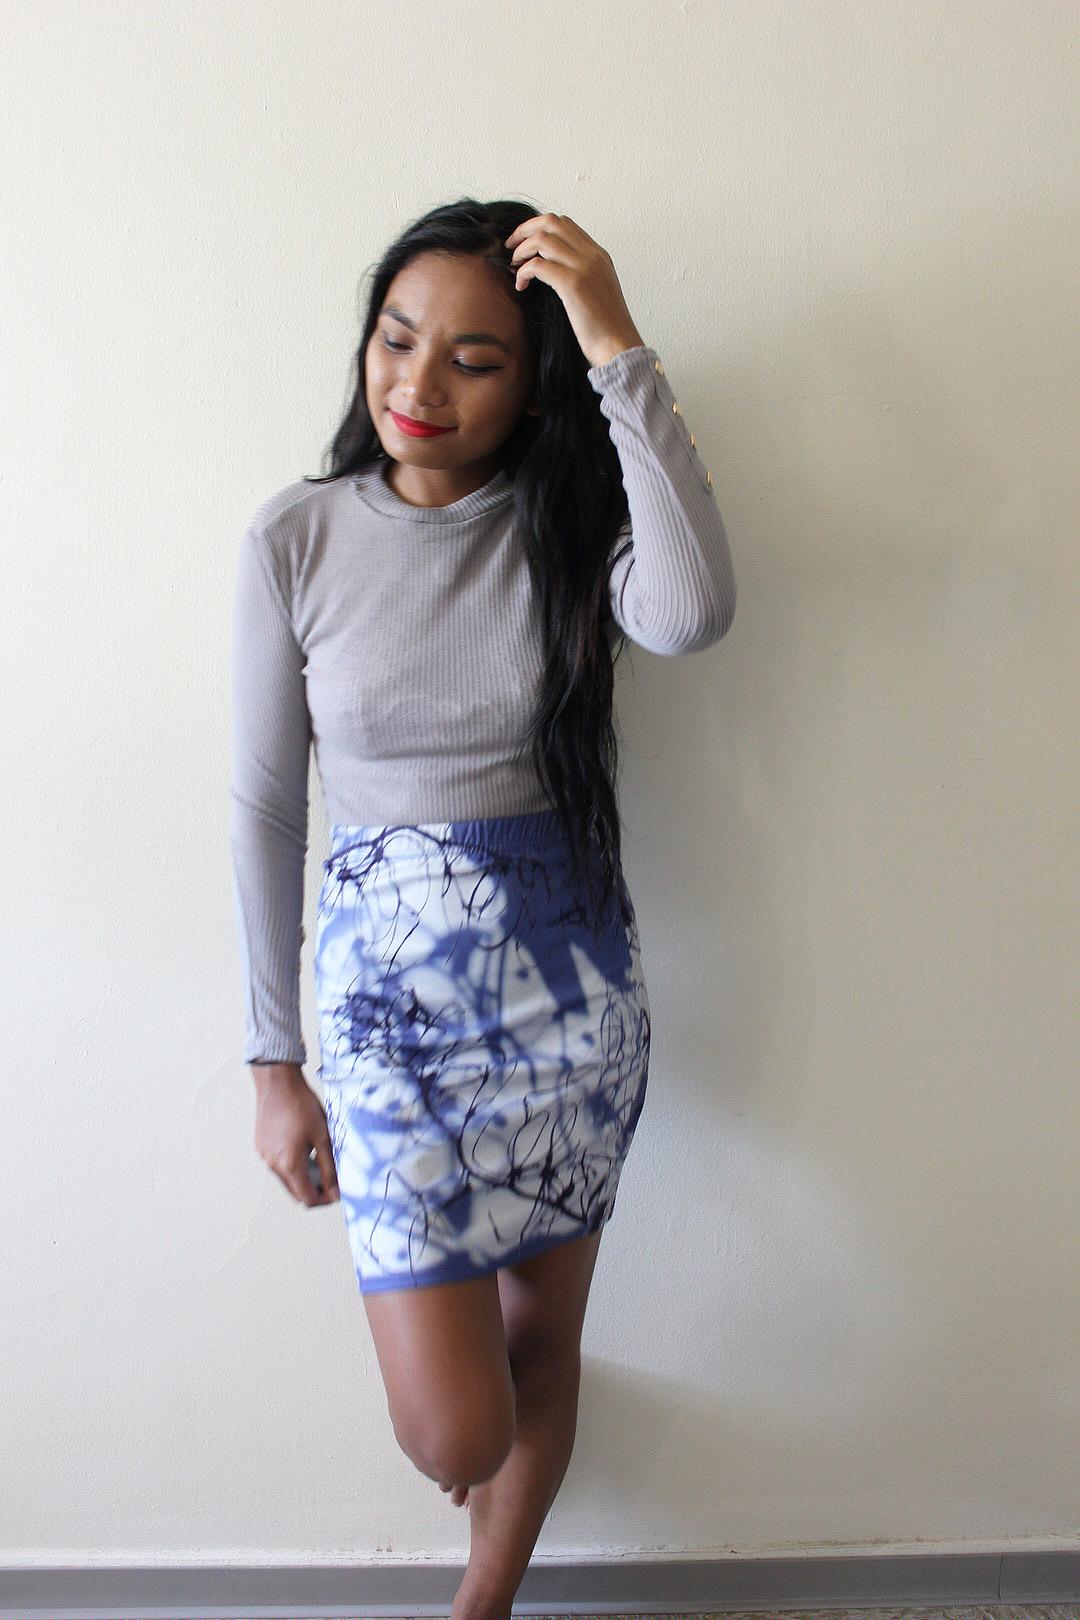 Bodysuits-Skirts-Rosegal-Fall-Style-Blogger-LINDATENCHITRAN-5-1616x1080